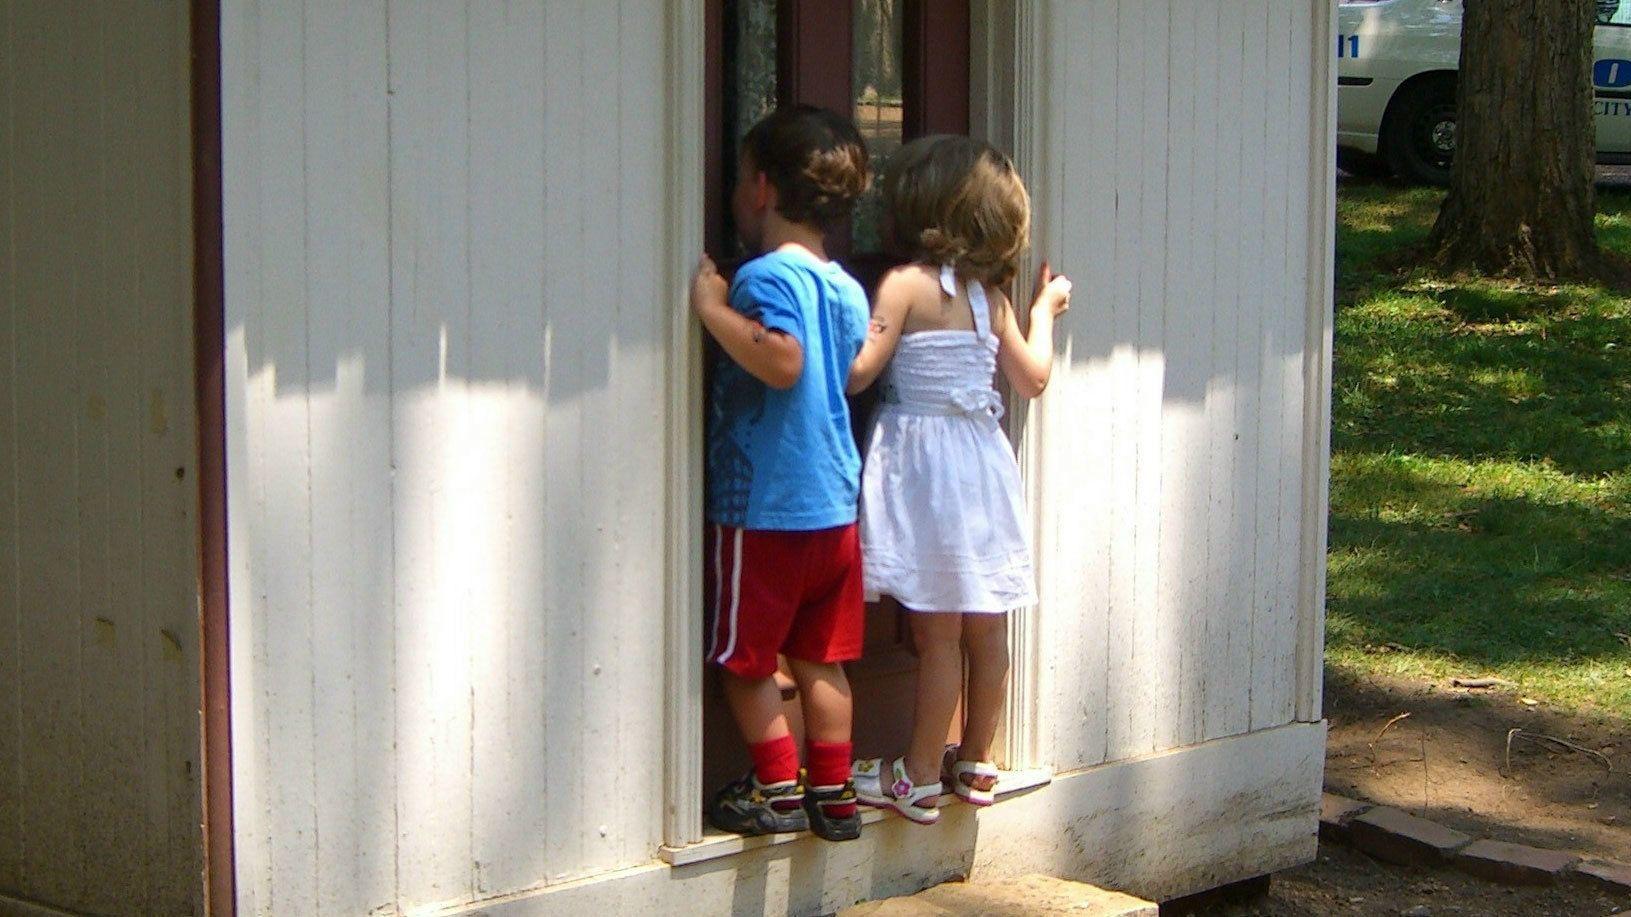 Visiting historic homes in Nashvile